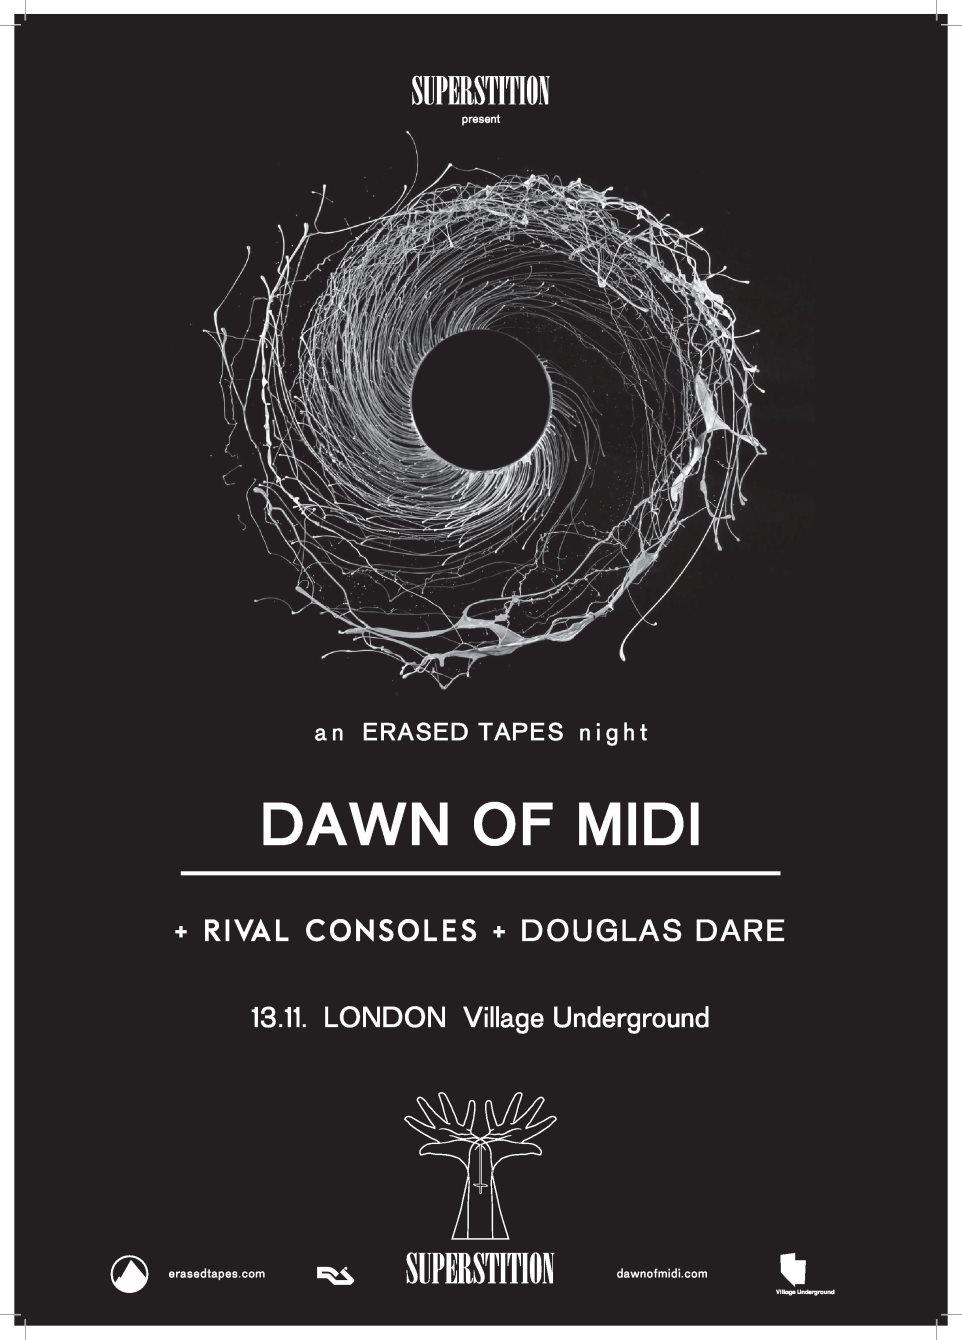 Superstition // Erased Tapes Dawn Of Midi, Rival Consoles & Douglas Dare - Flyer front